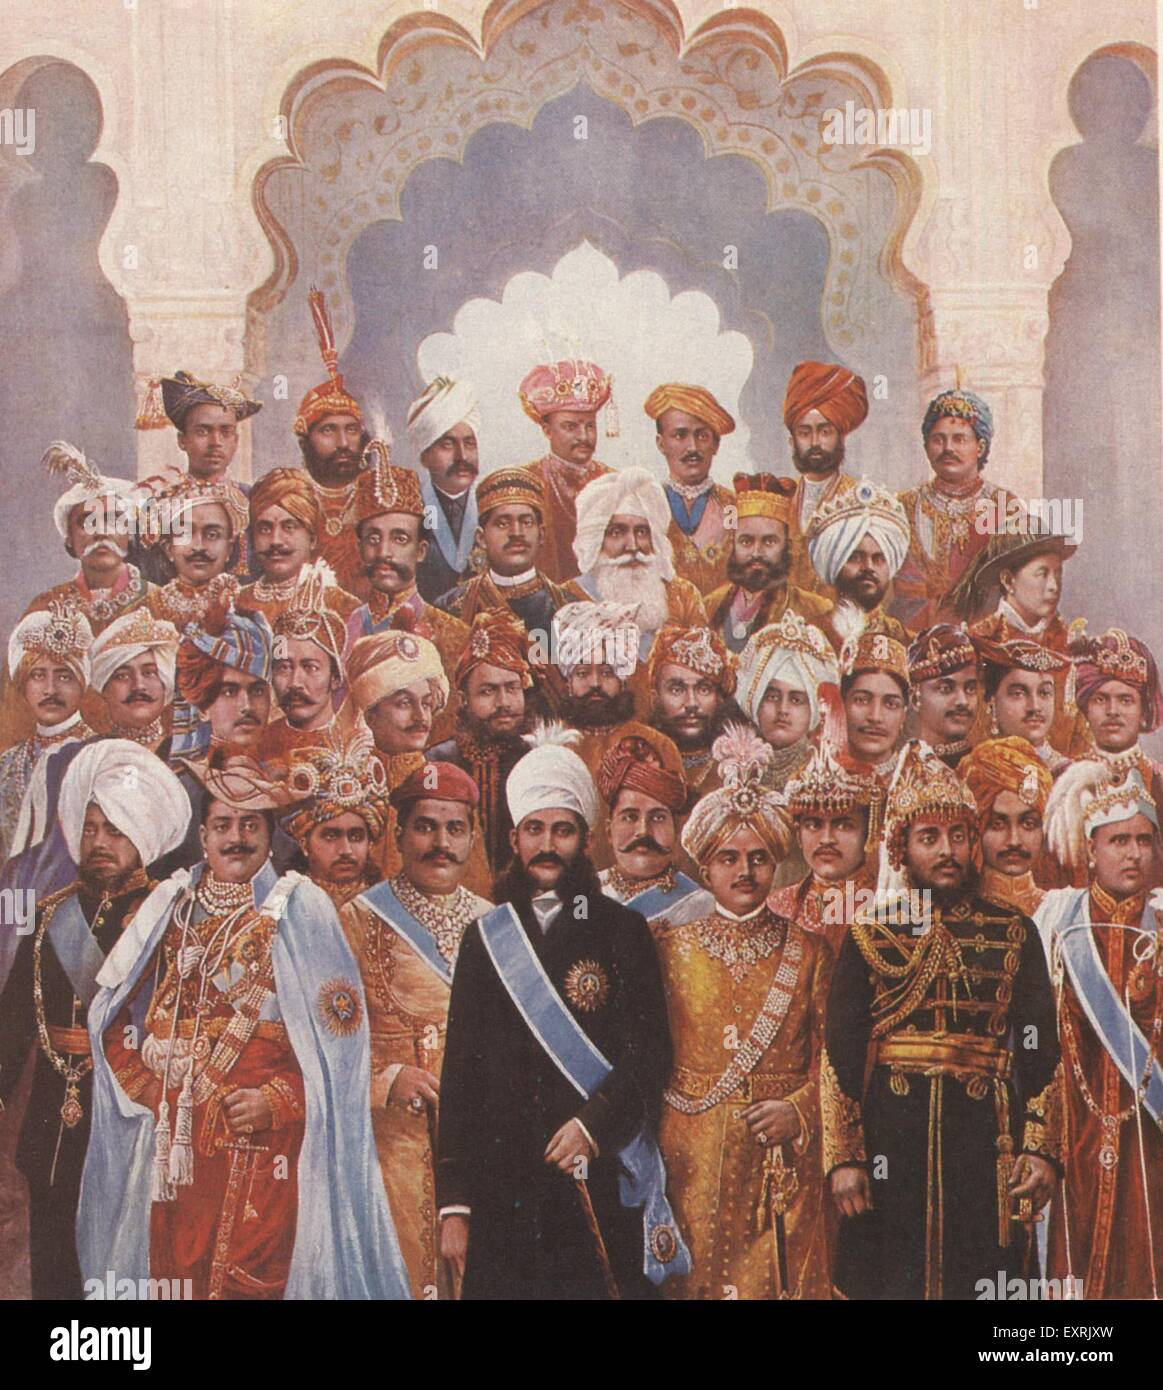 1930s UK India The British Empire Last Days Raj Magazine Plate - Stock Image